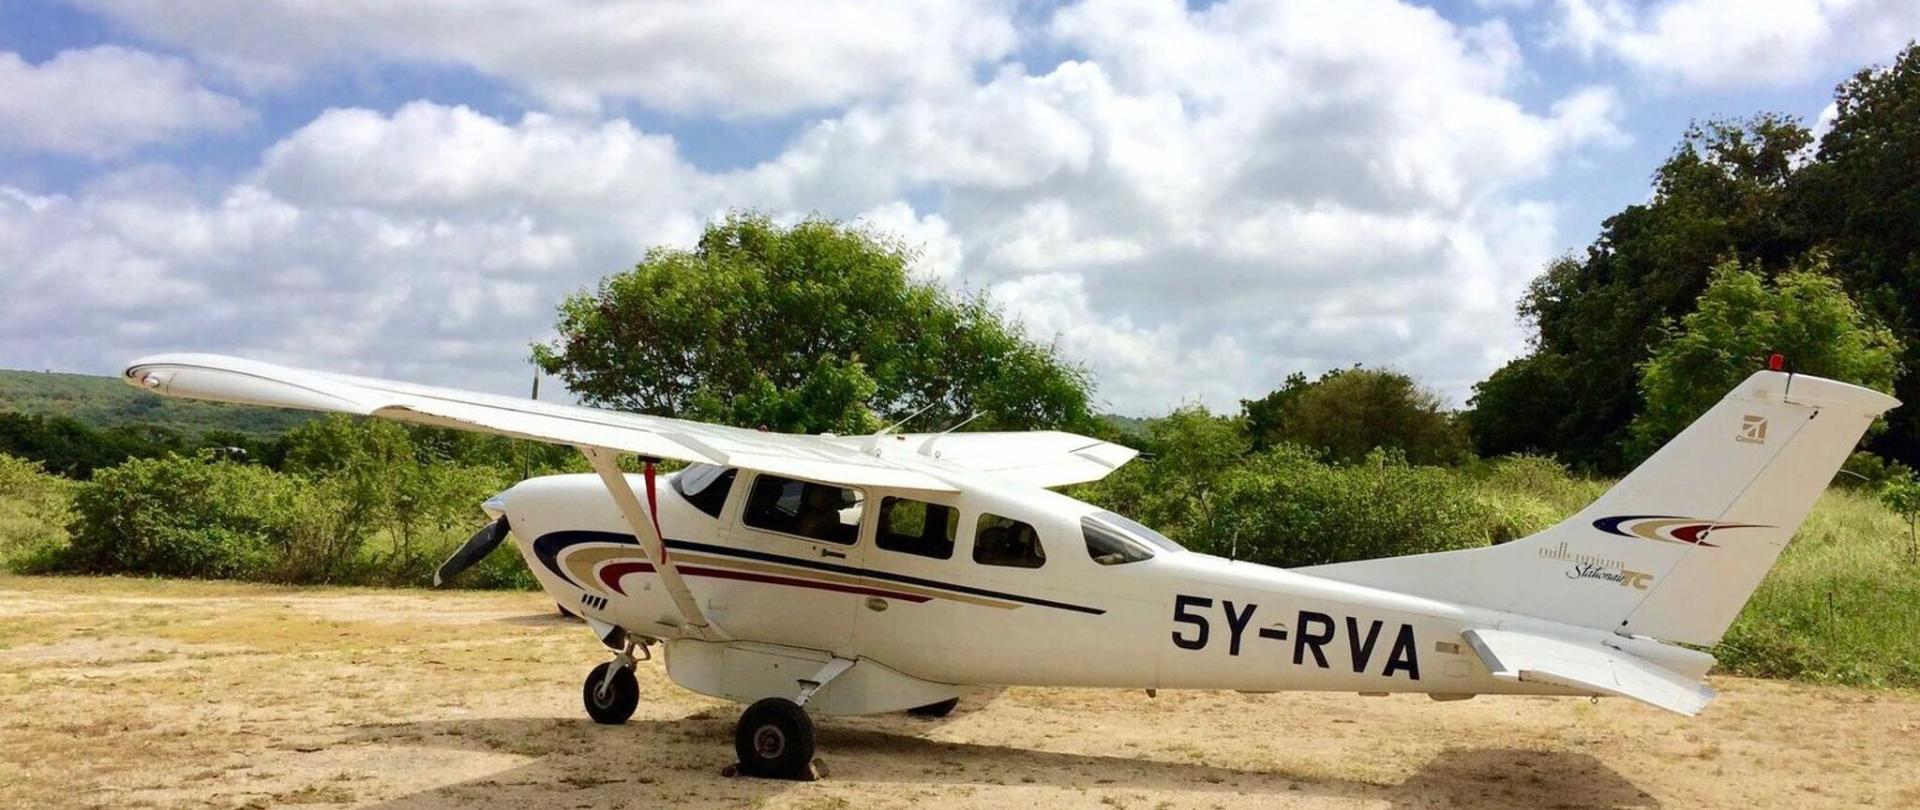 Saruni Scenic Air.4.jpeg